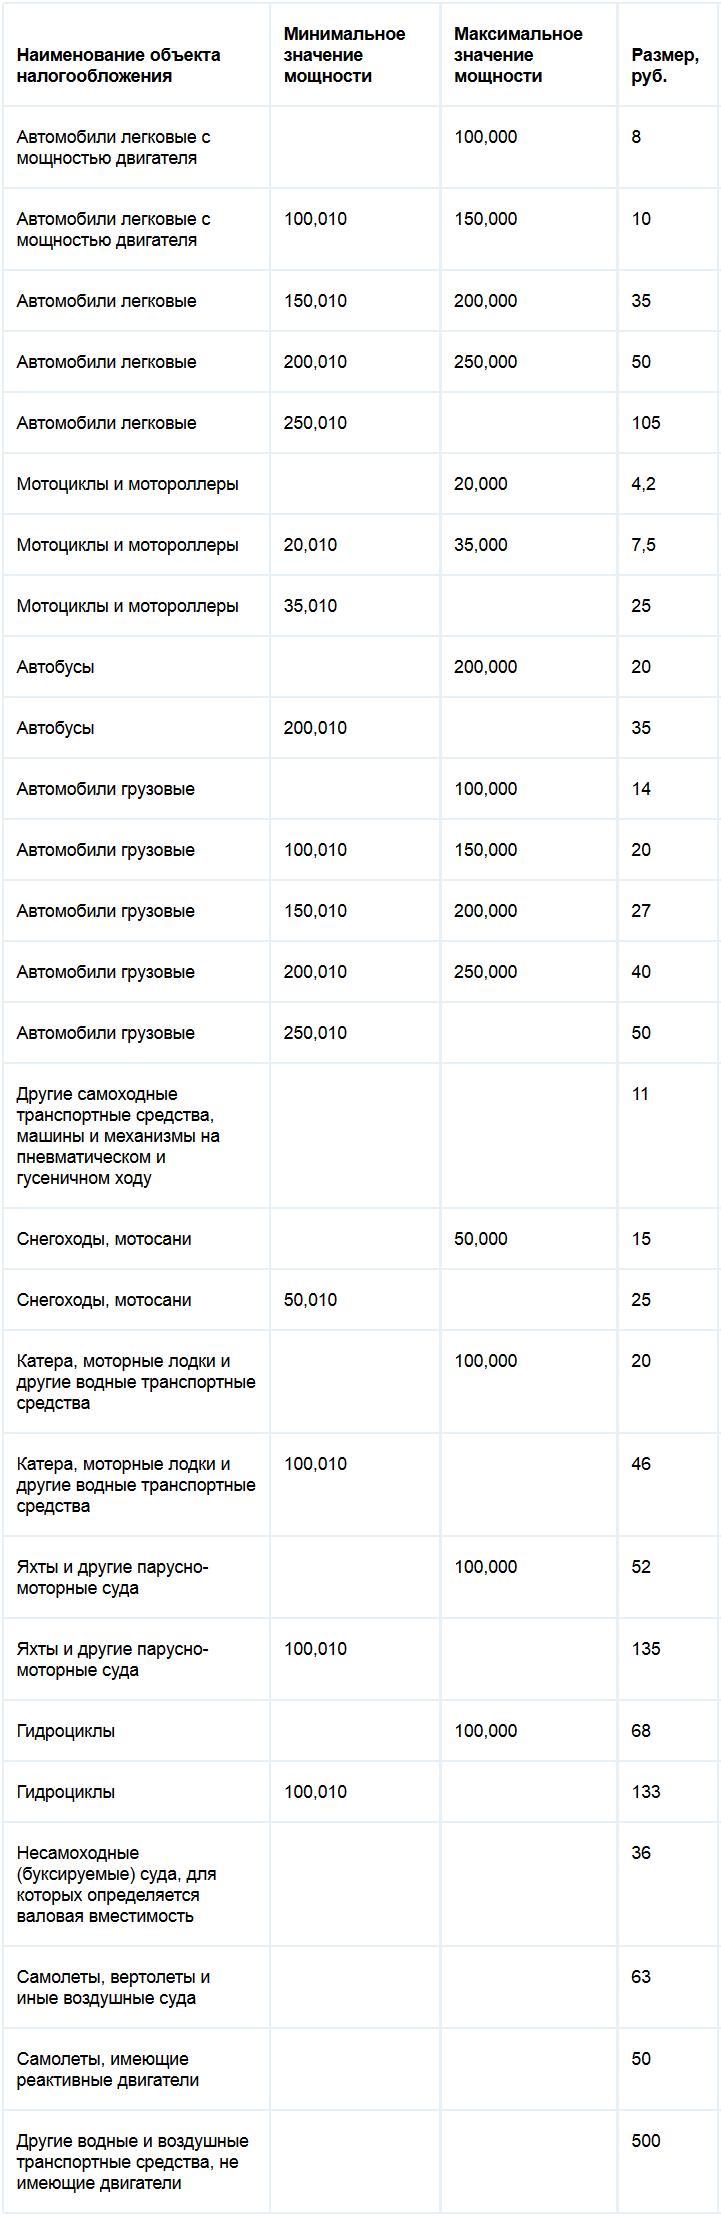 Ставки транспортного налога республики Дагестан